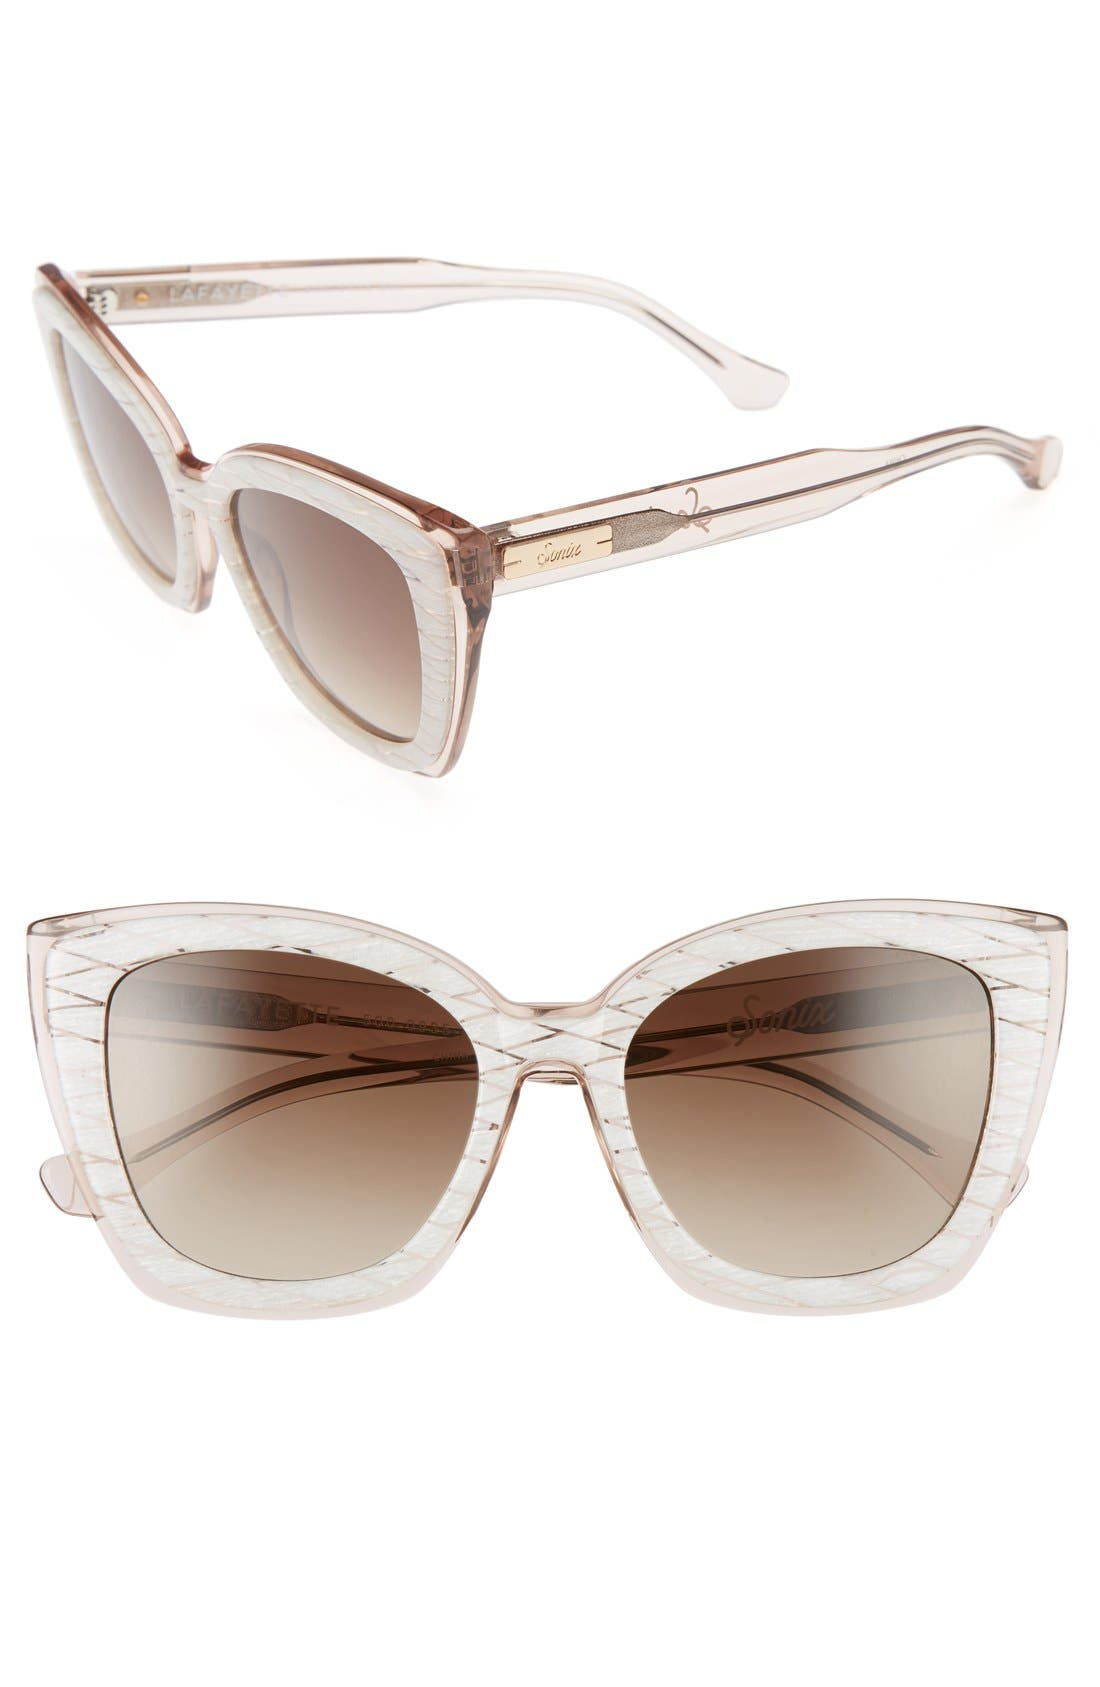 Alternate Image 1 Selected - Sonix Lafayette 53mm Gradient Cat Eye Sunglasses